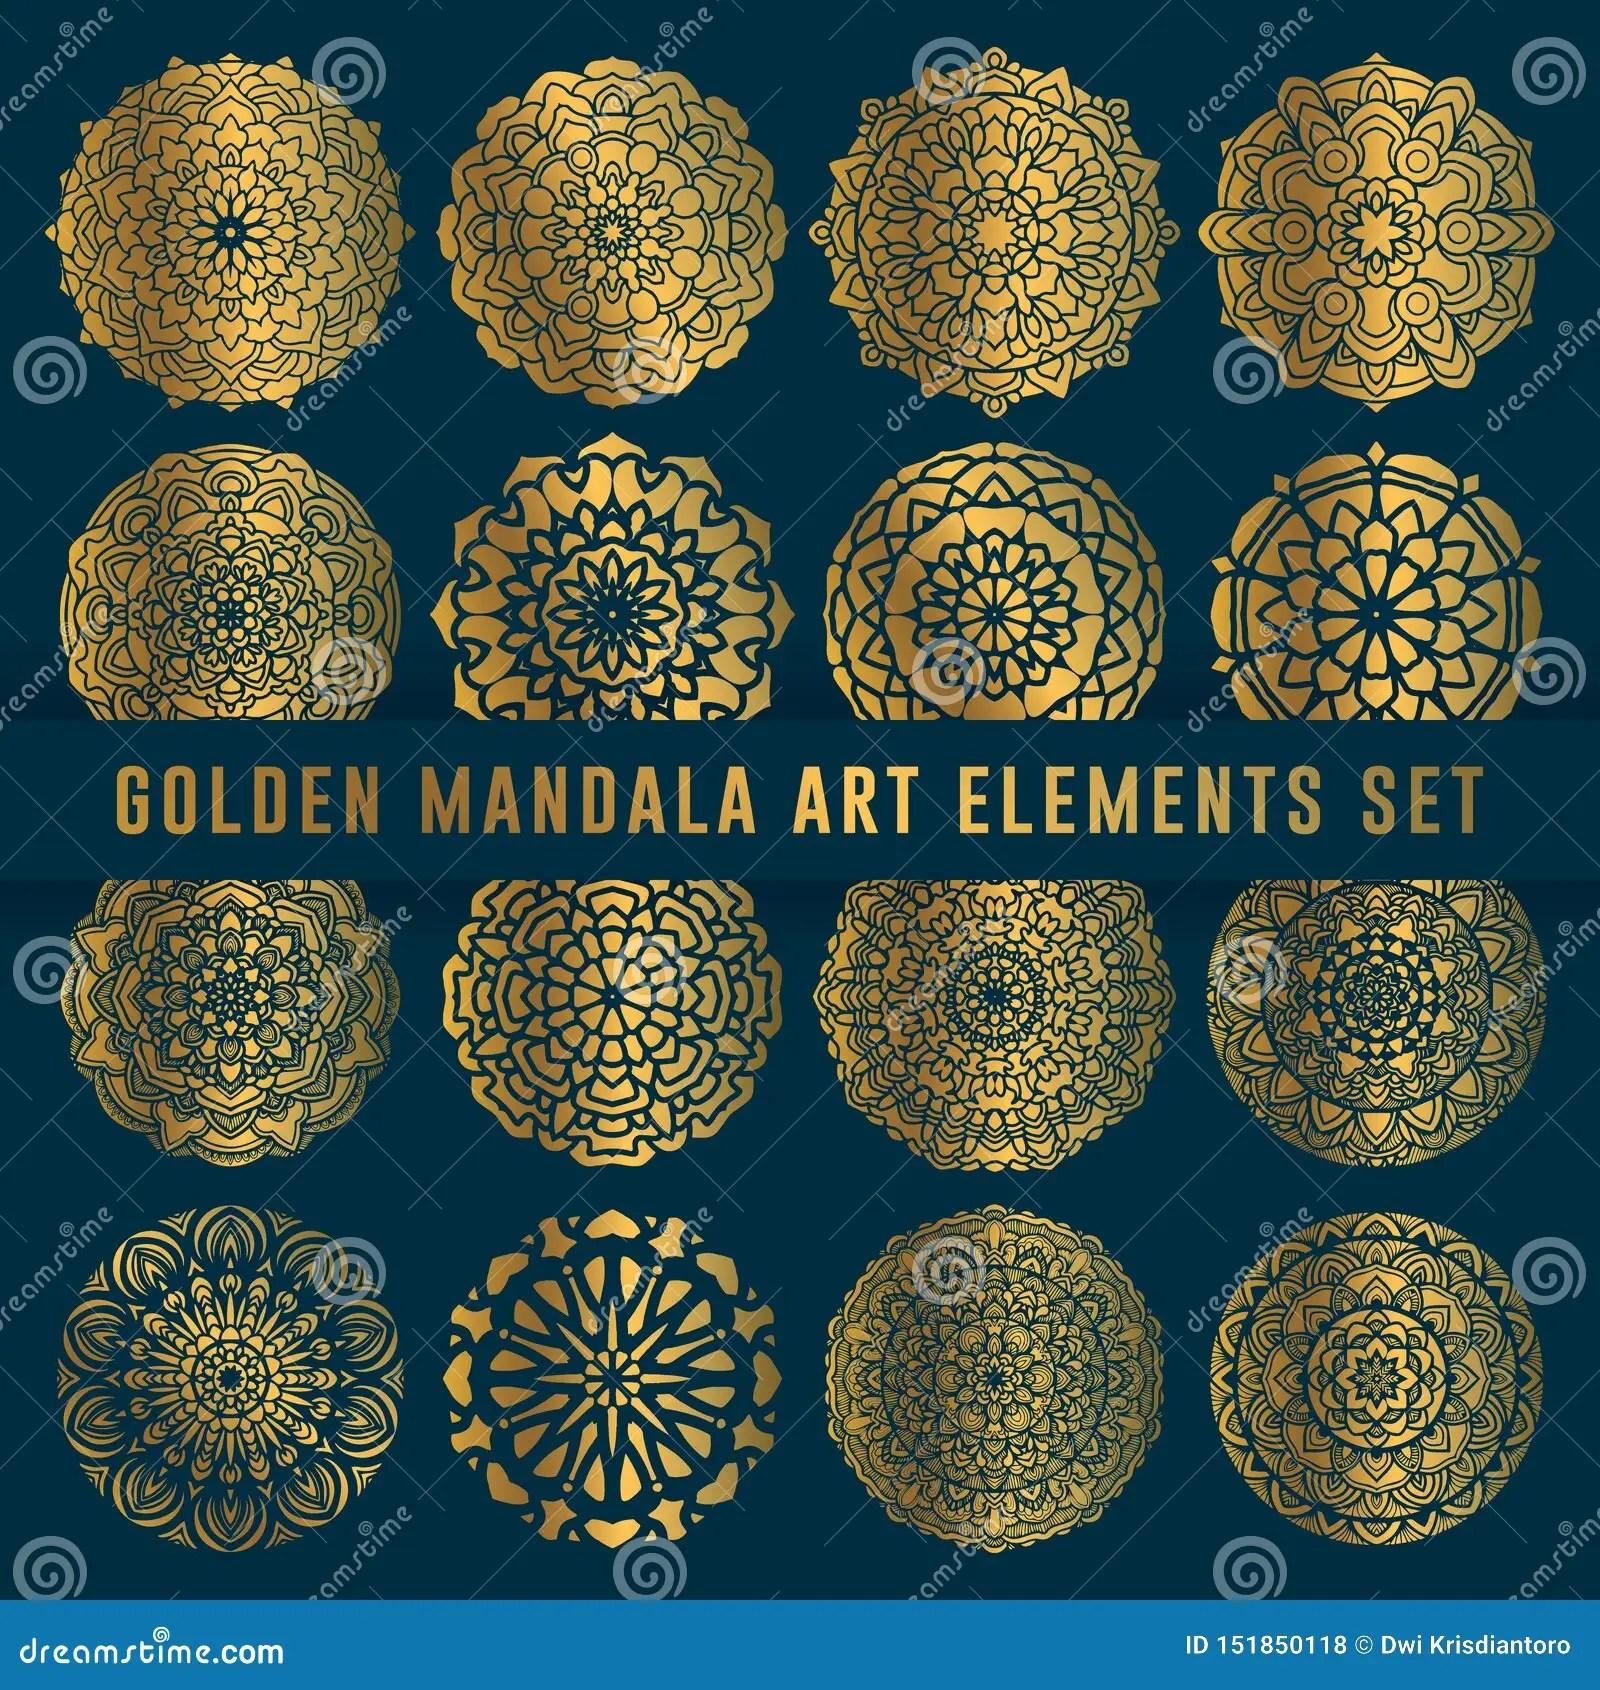 Detailed Golden Mandala Art Set Element Vintage Mandala